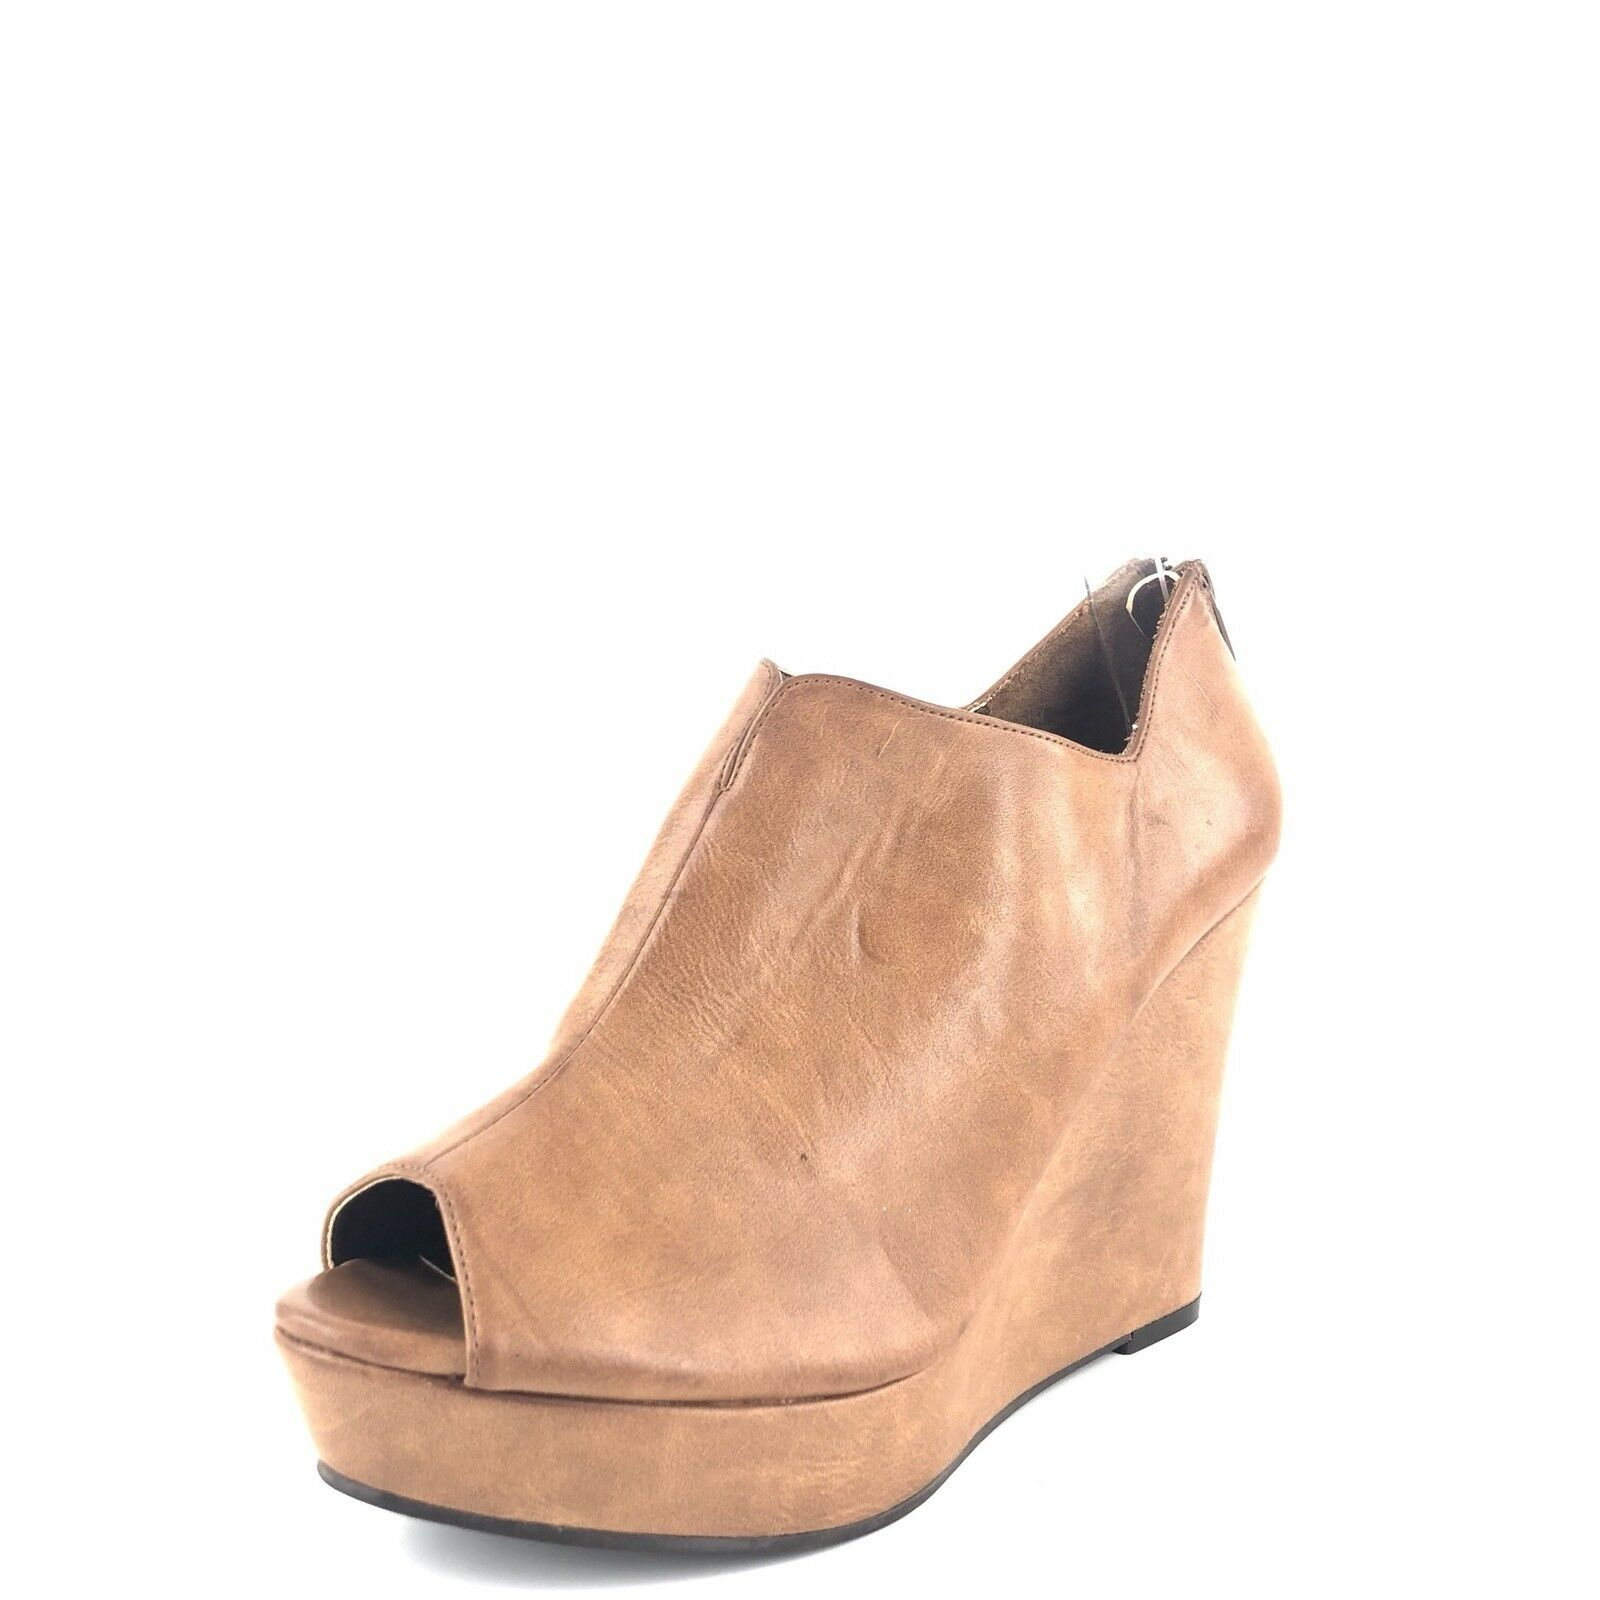 BP.  Womens Heels Wedges Open Toe Tan Leather Size 9.5 M